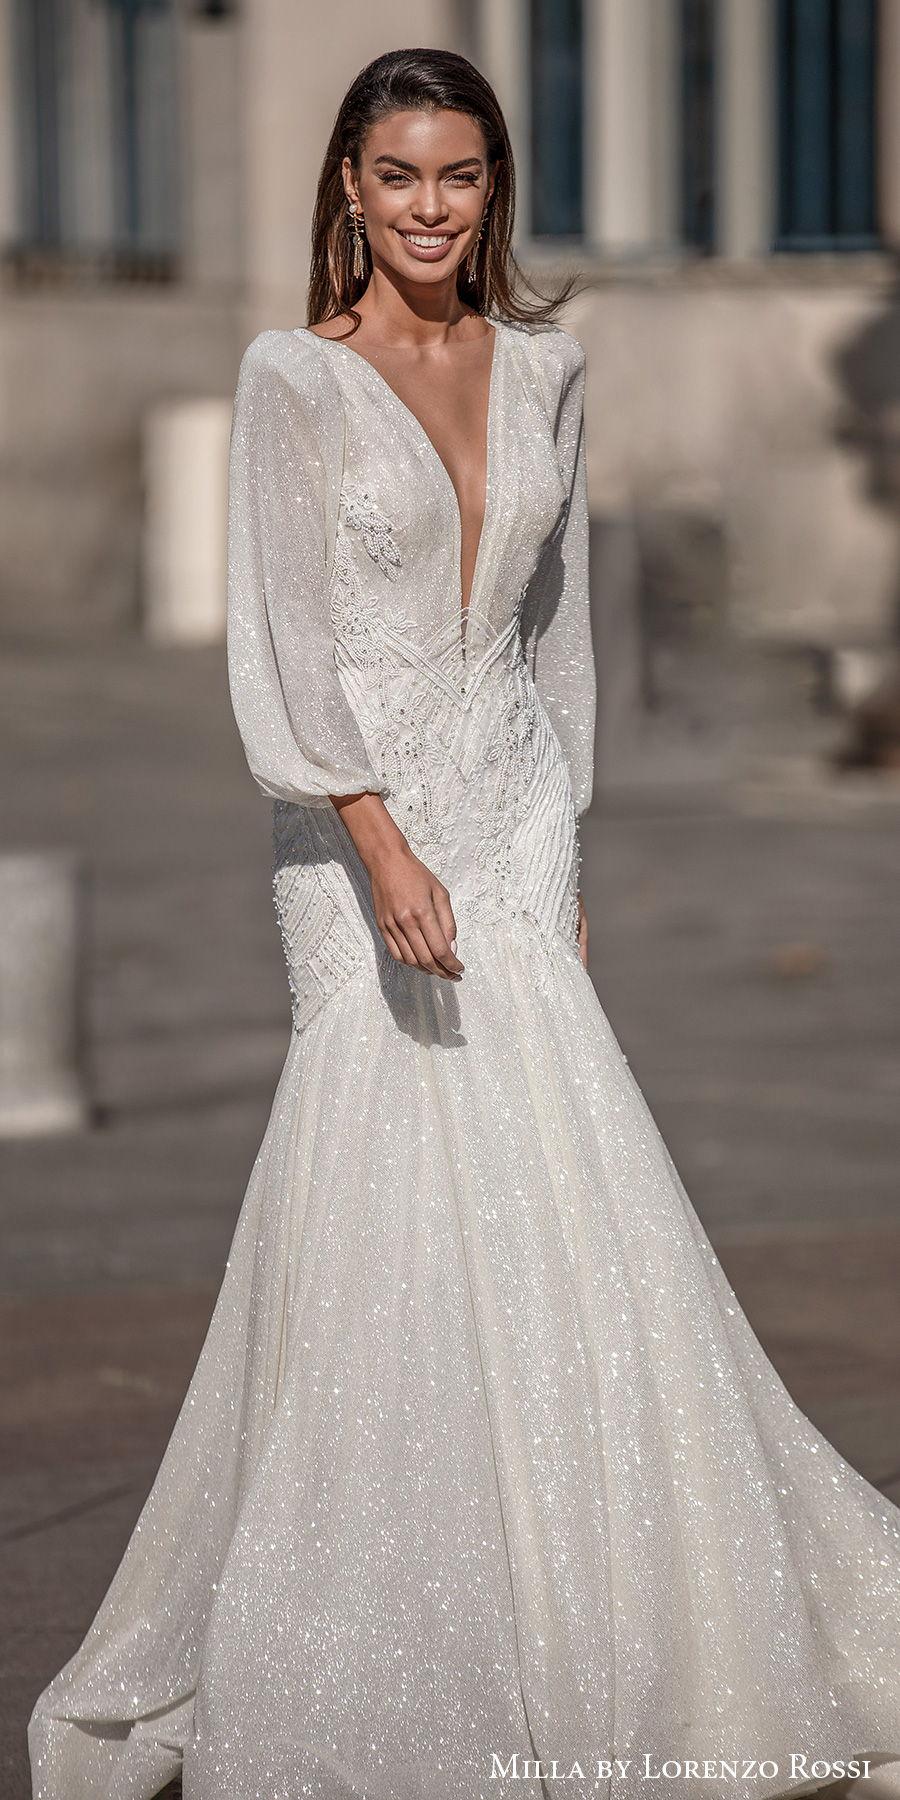 milla lorenzo rossi 2021 bridal long bishop sleeves deep plunging v neck full embellishment glitter elegant mermaid wedding dress v back chapel train (jayden) mv